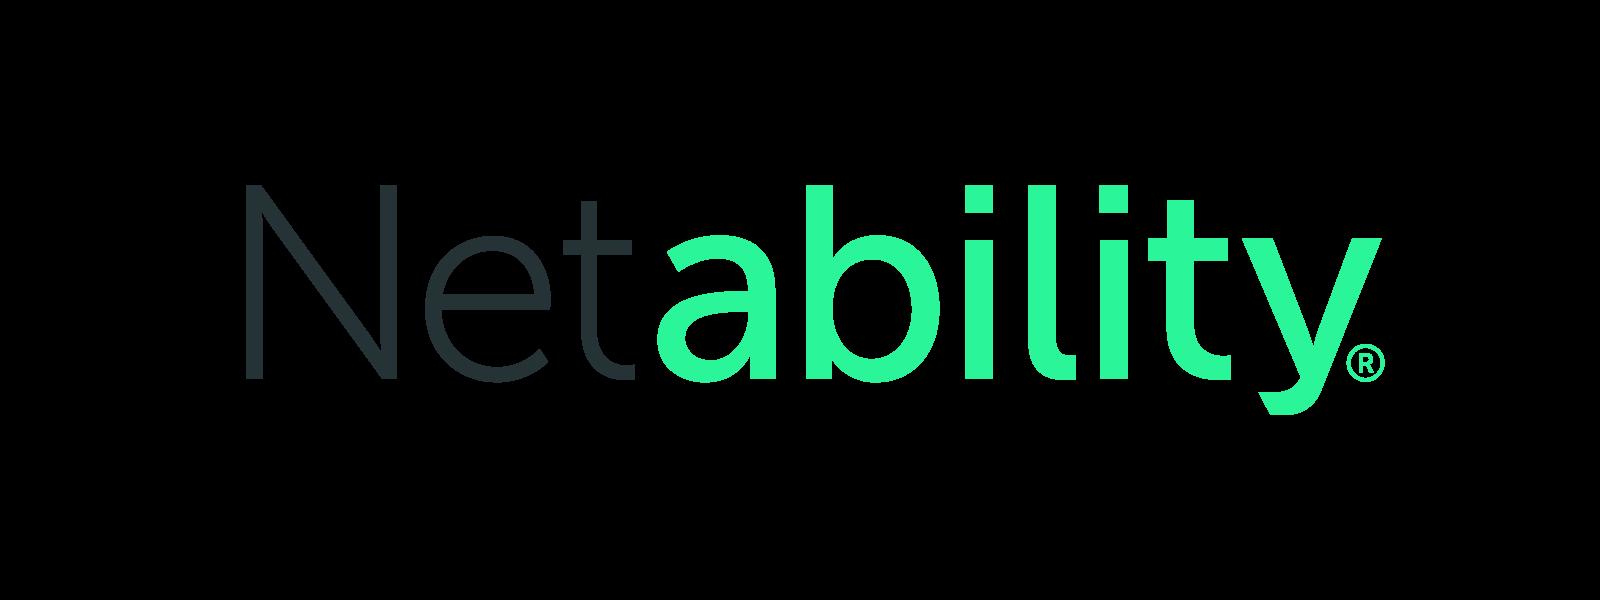 Netability®